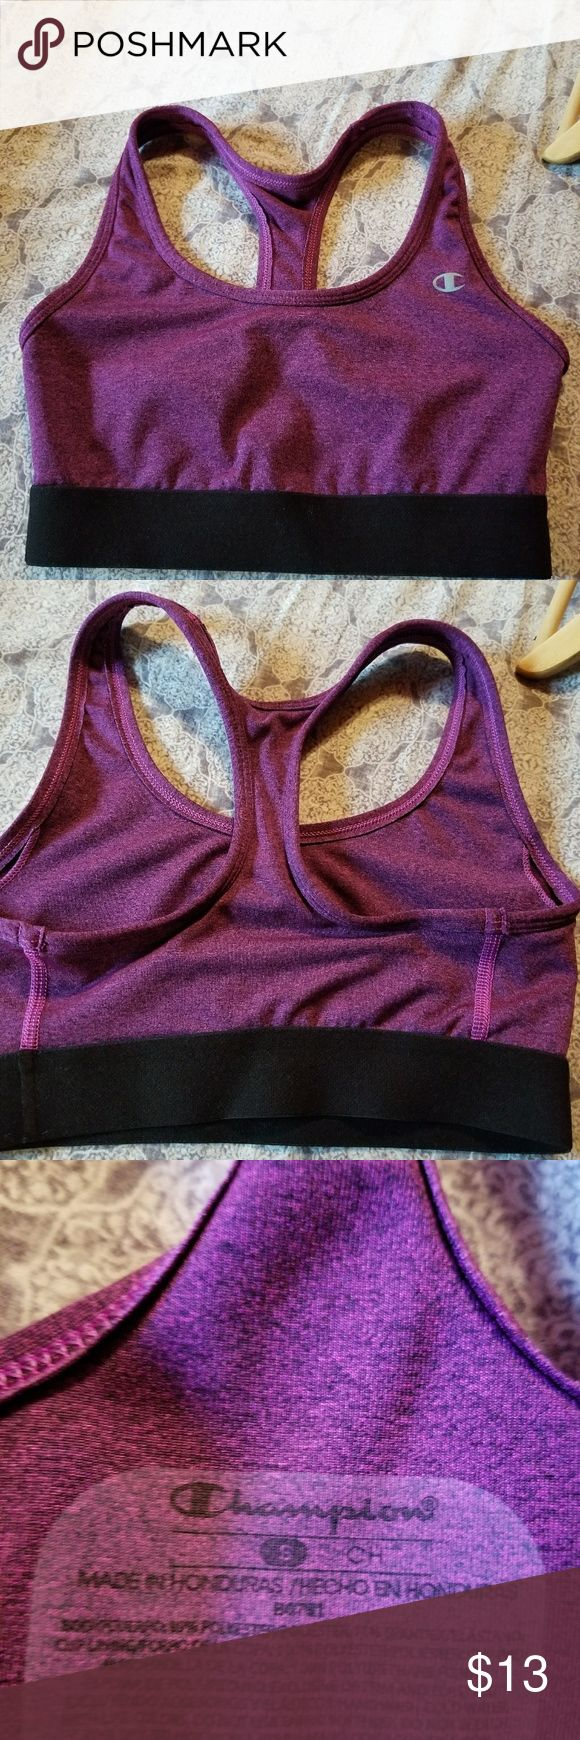 Brand new champion sports bra Brand new love the color Champion Intimates & Sleepwear Bras